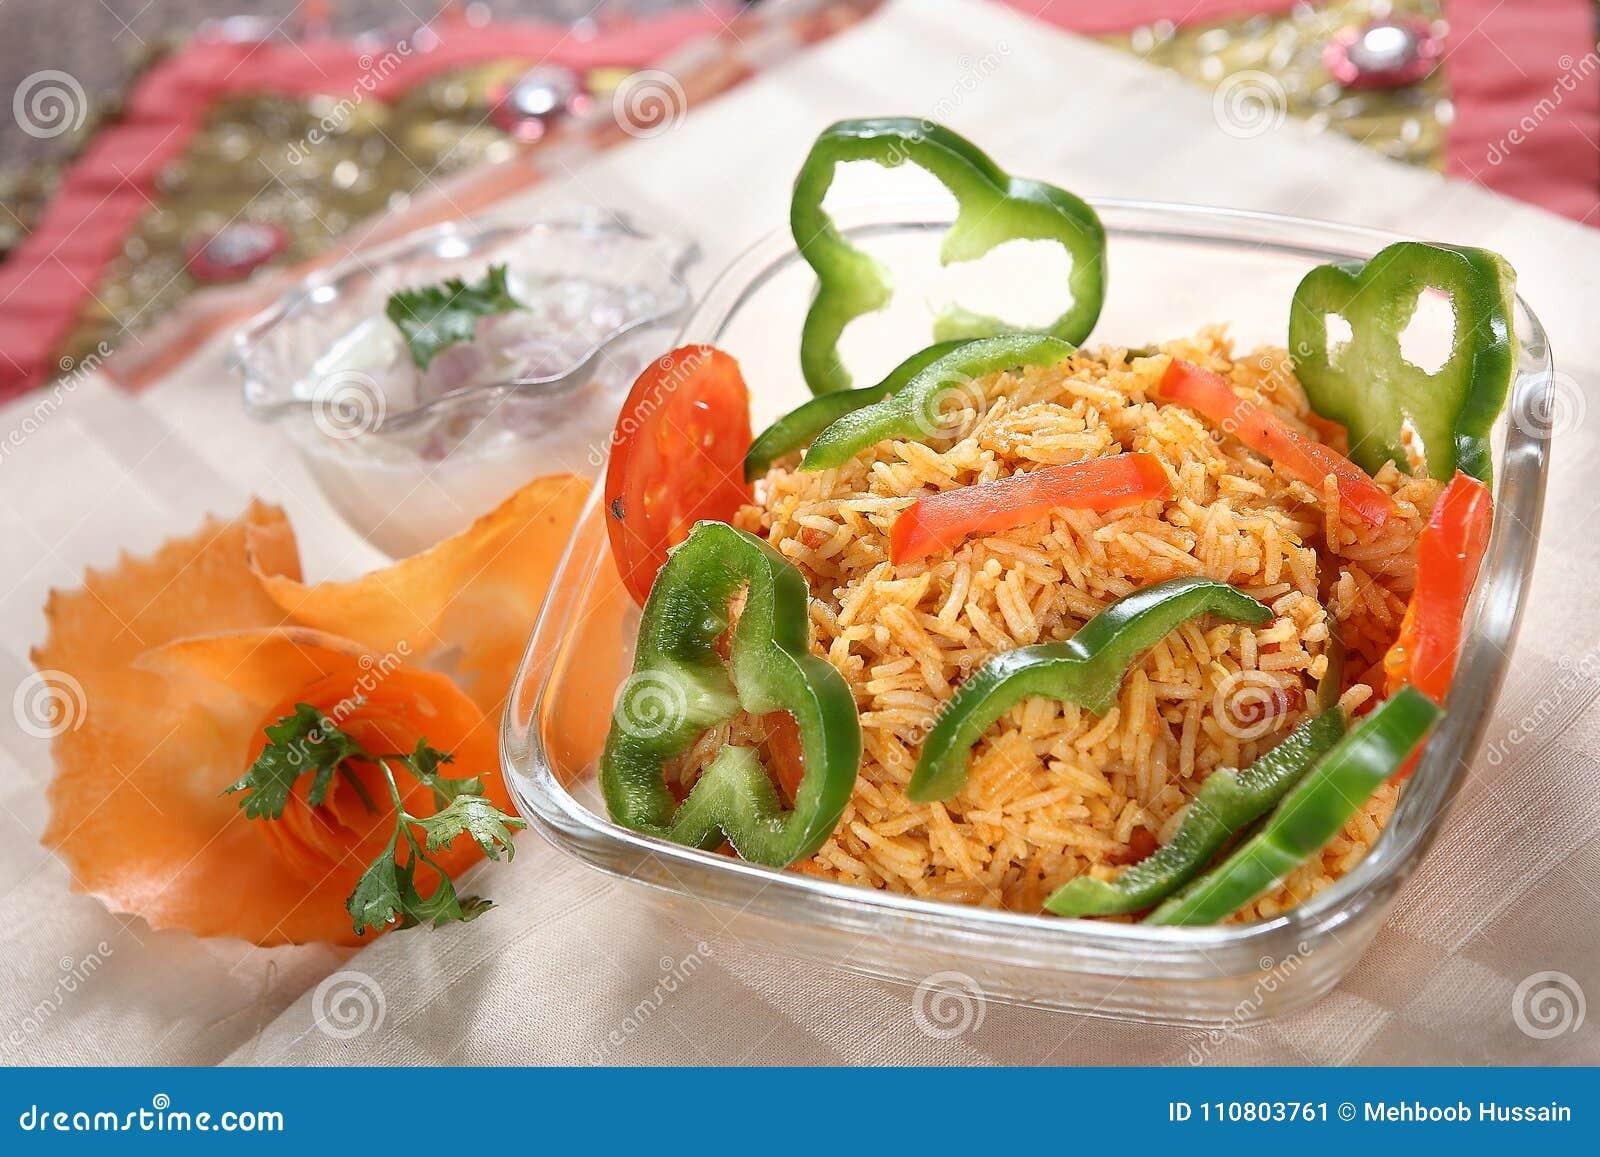 Arroz mexicano, arroz mexicano simples